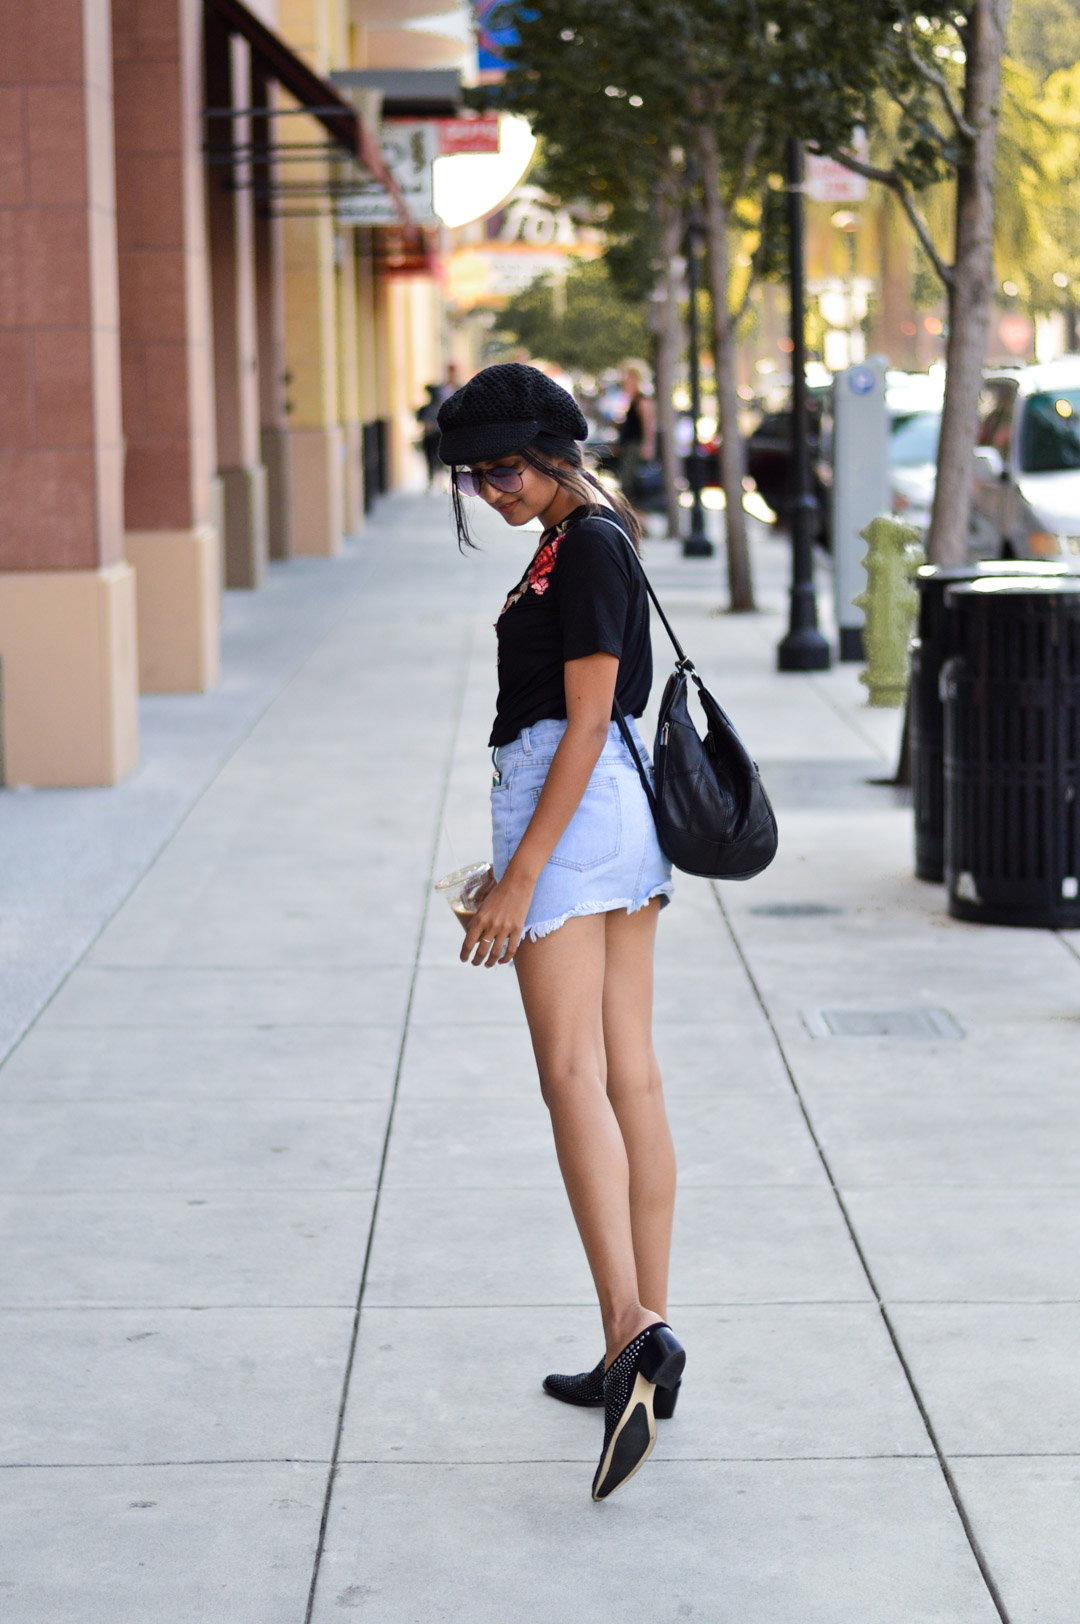 Casual-friday-style-denim-skirt-black-tee-fall-style 6